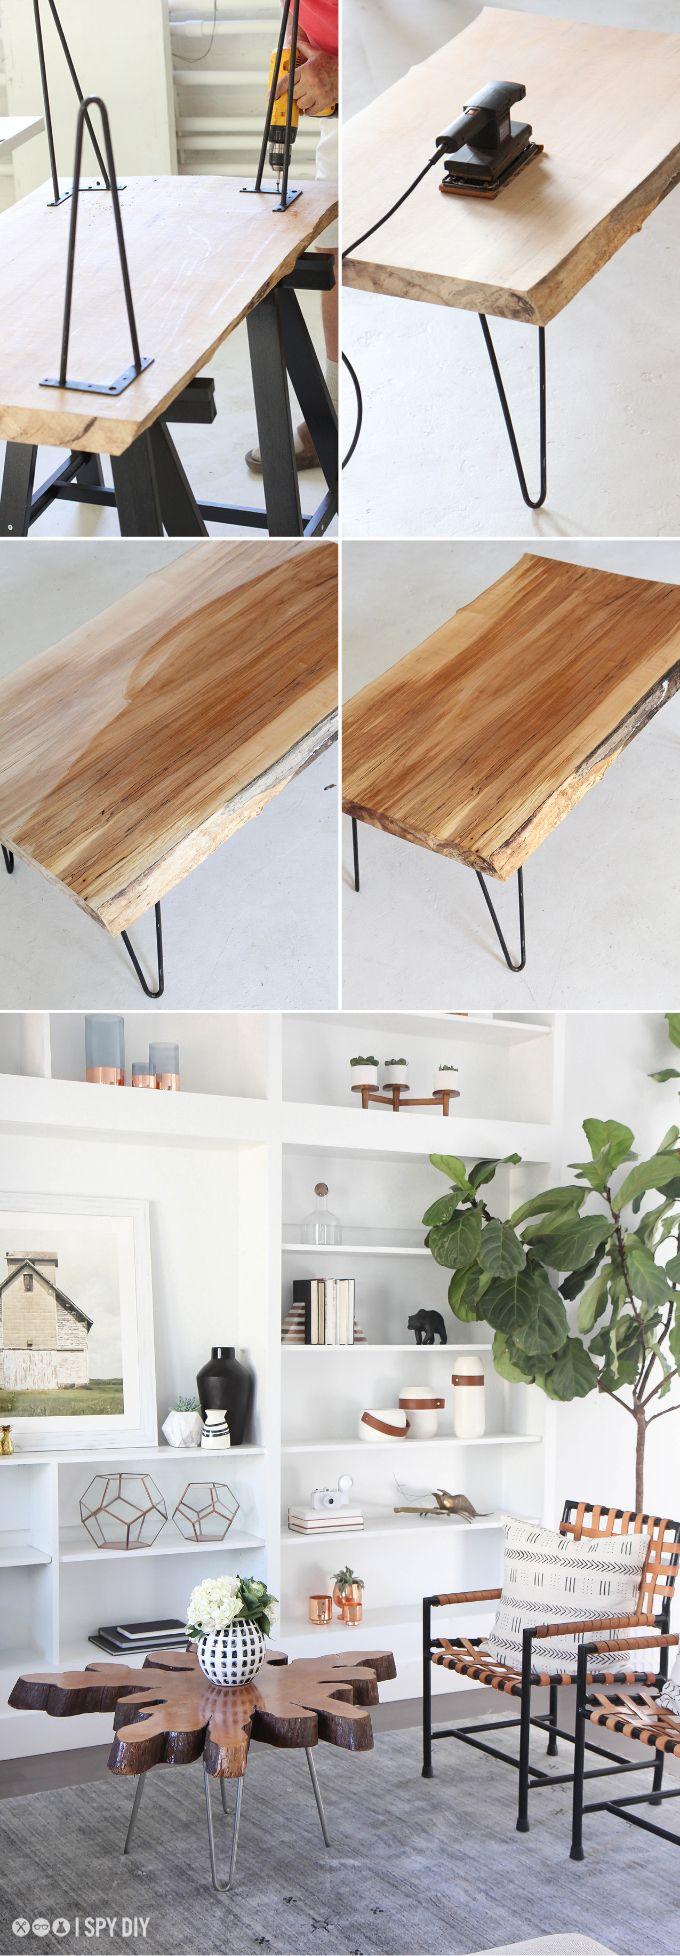 steps diy wood slab hairpin leg coffee table ispydiy i spy d